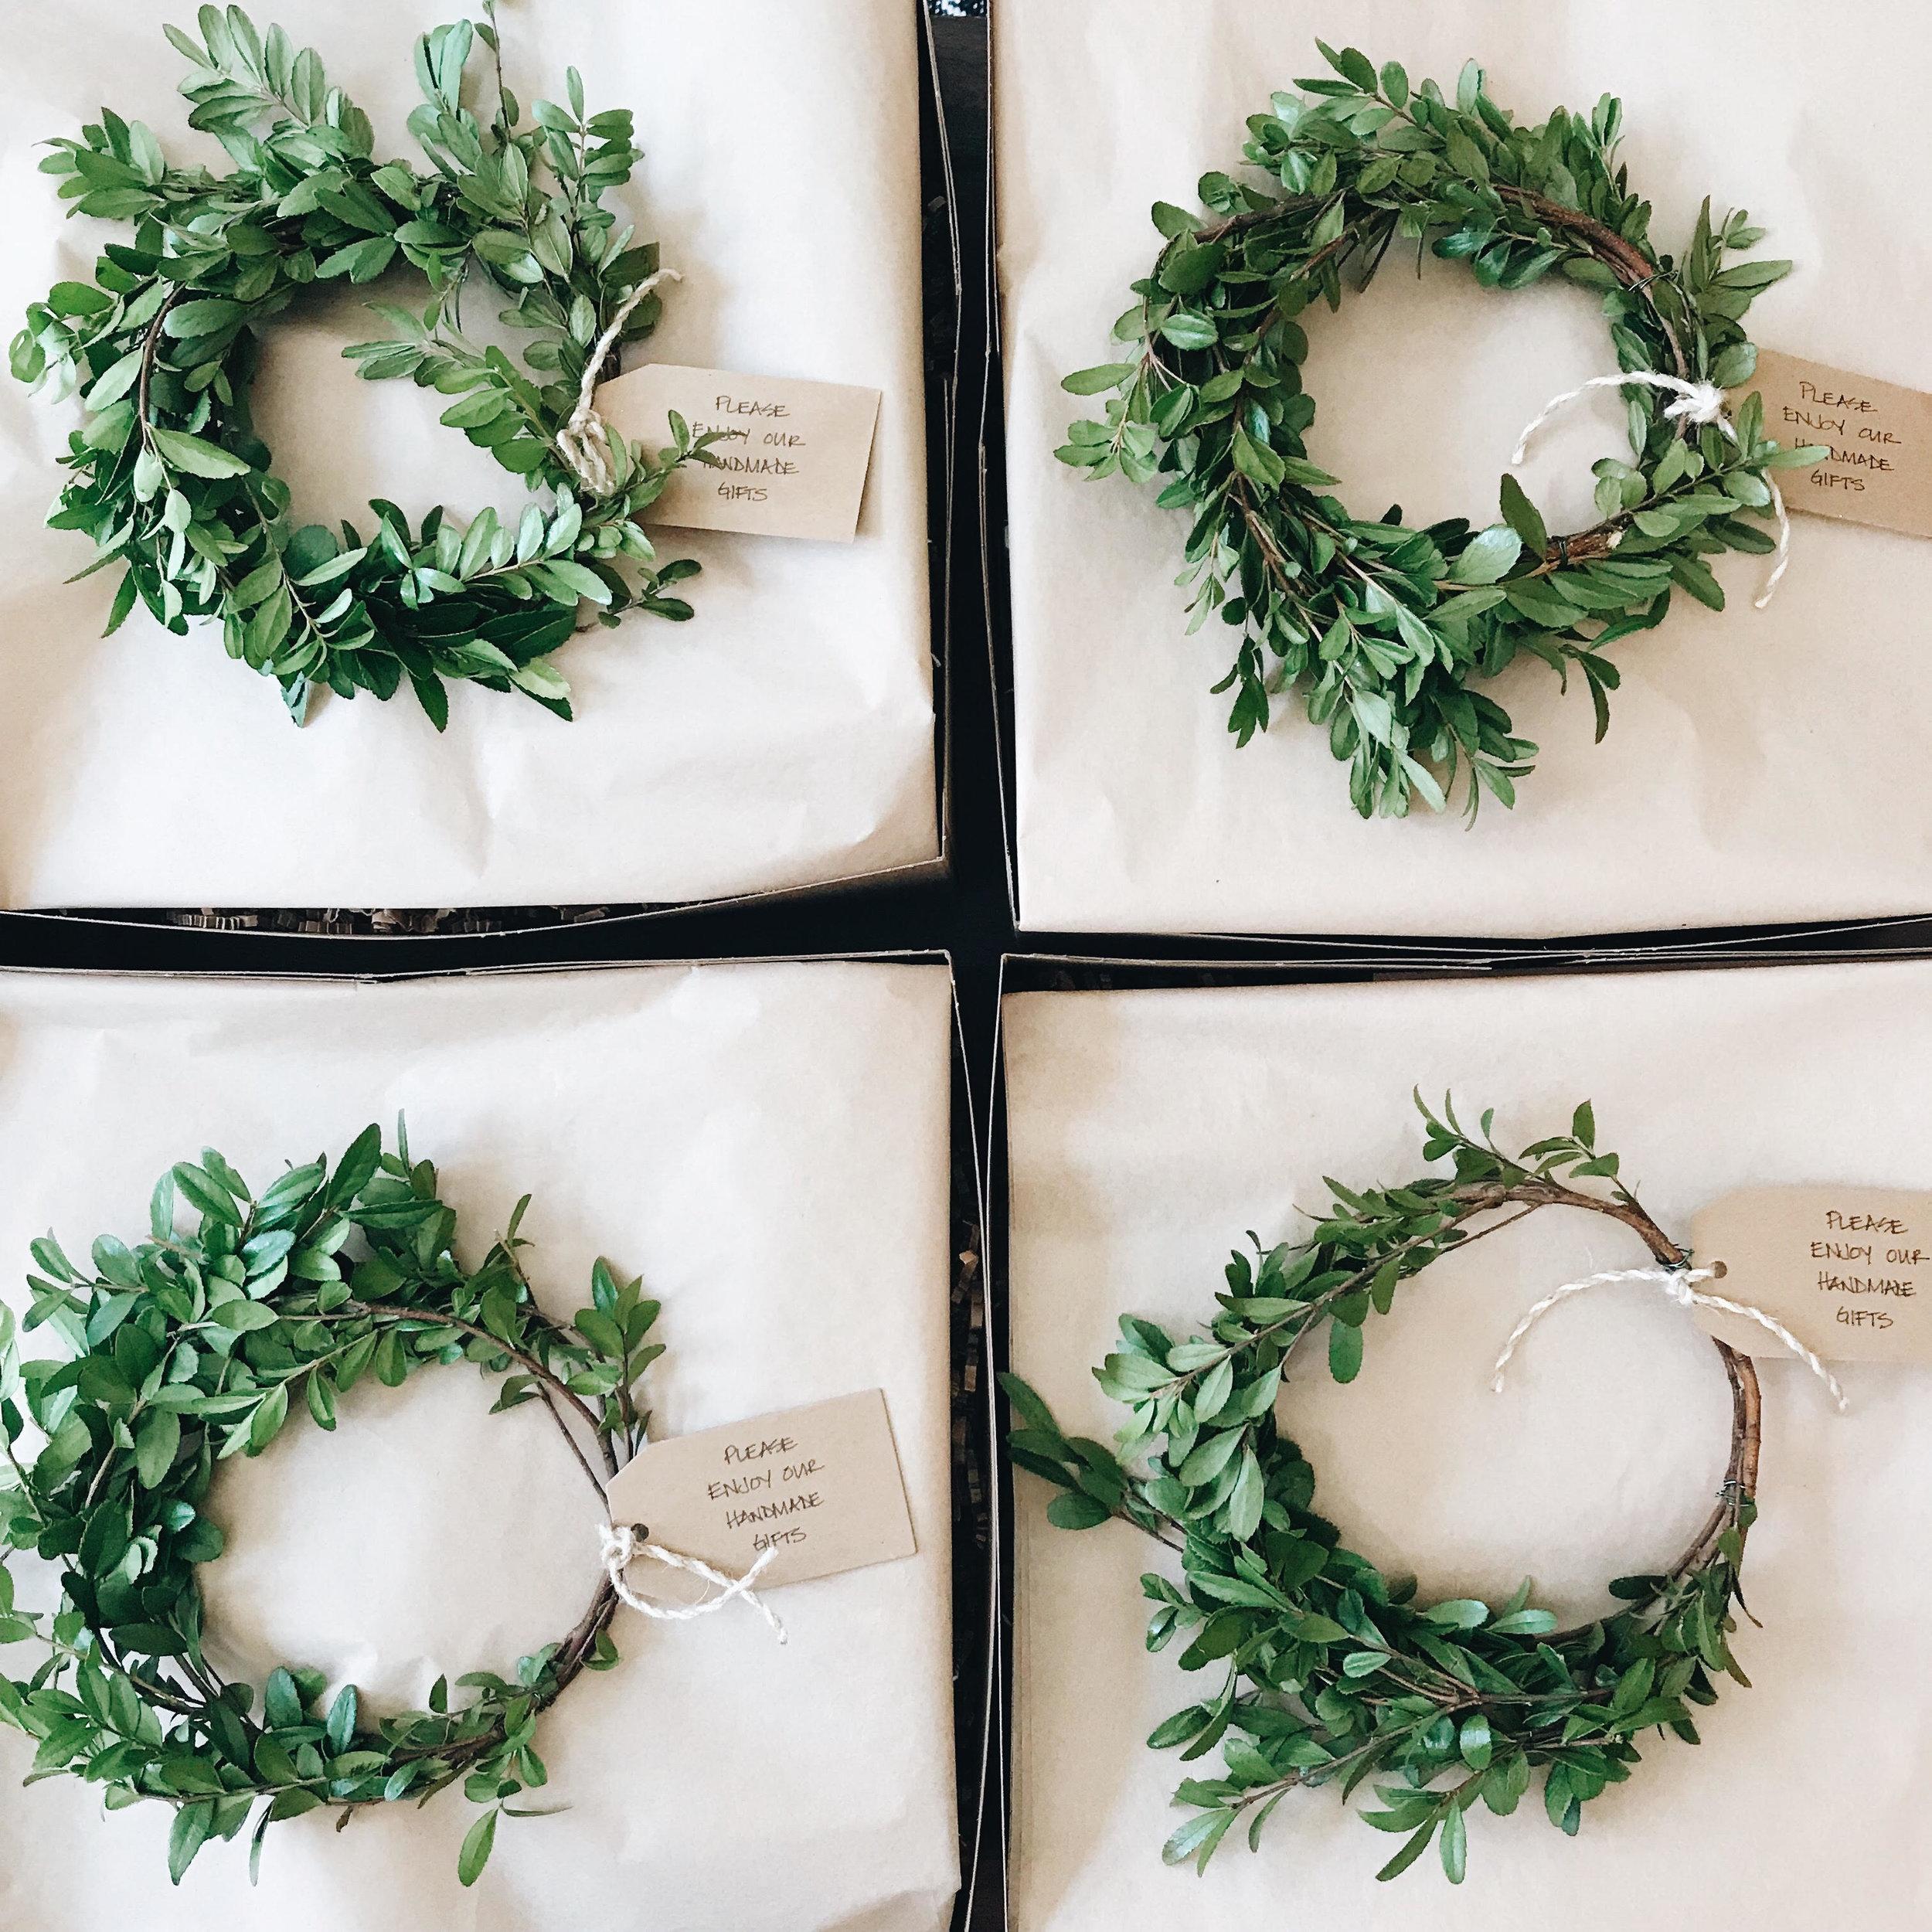 Christmas Greens, Wreaths, Nyla Free Designs Inc., Calgary Interior Designer